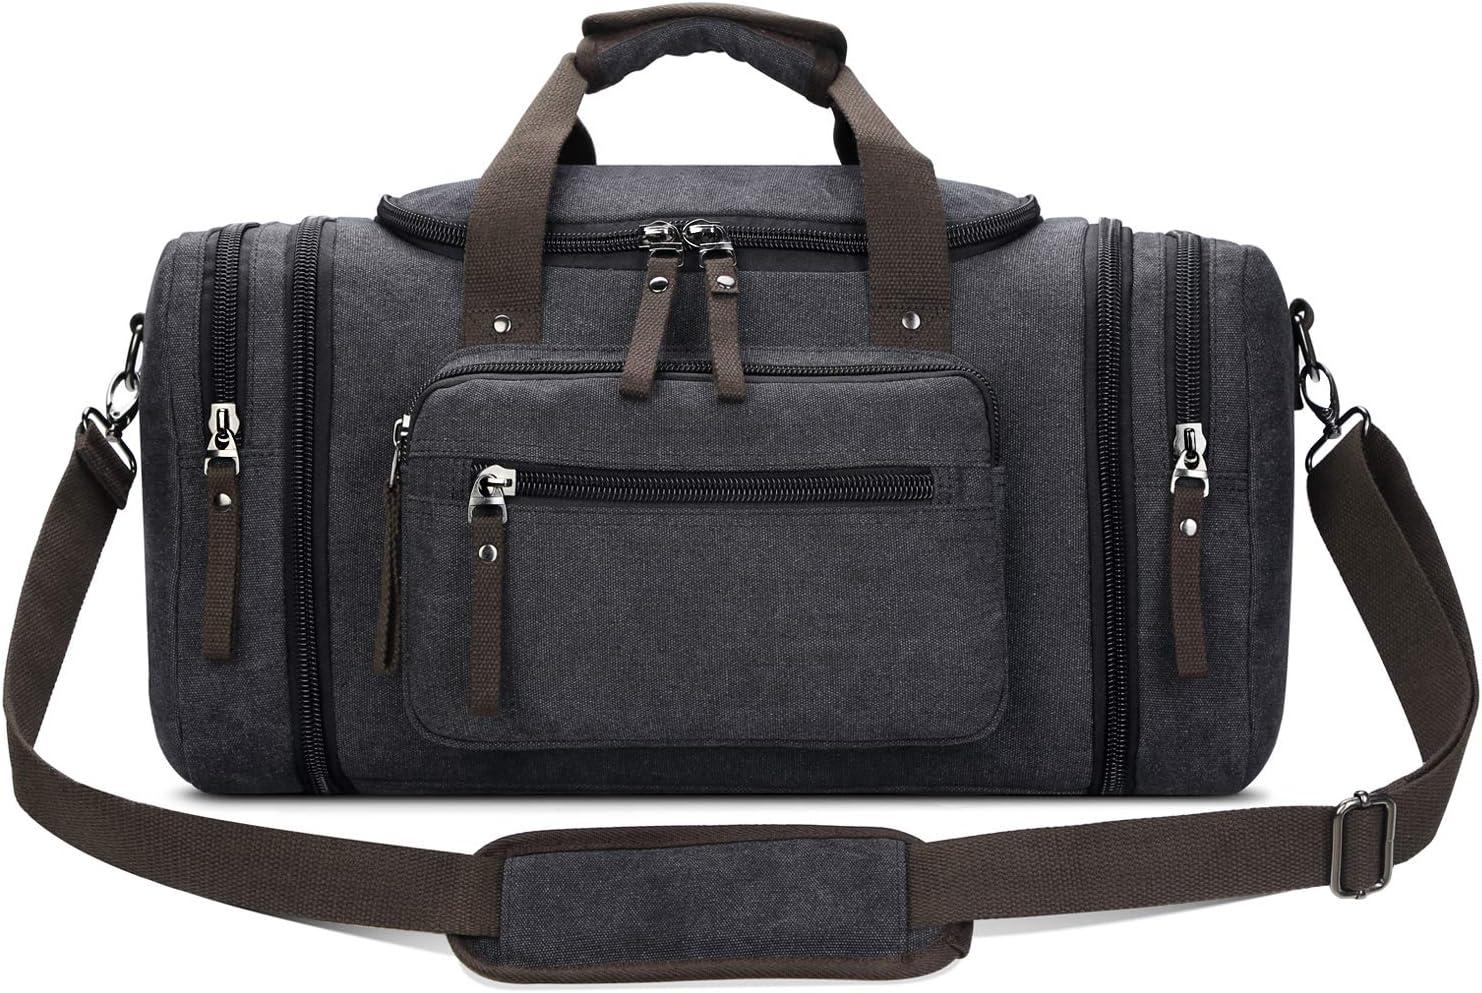 Toupons Travel Duffel Bag for Men Canvas Overnight Weekend Bag (Black )